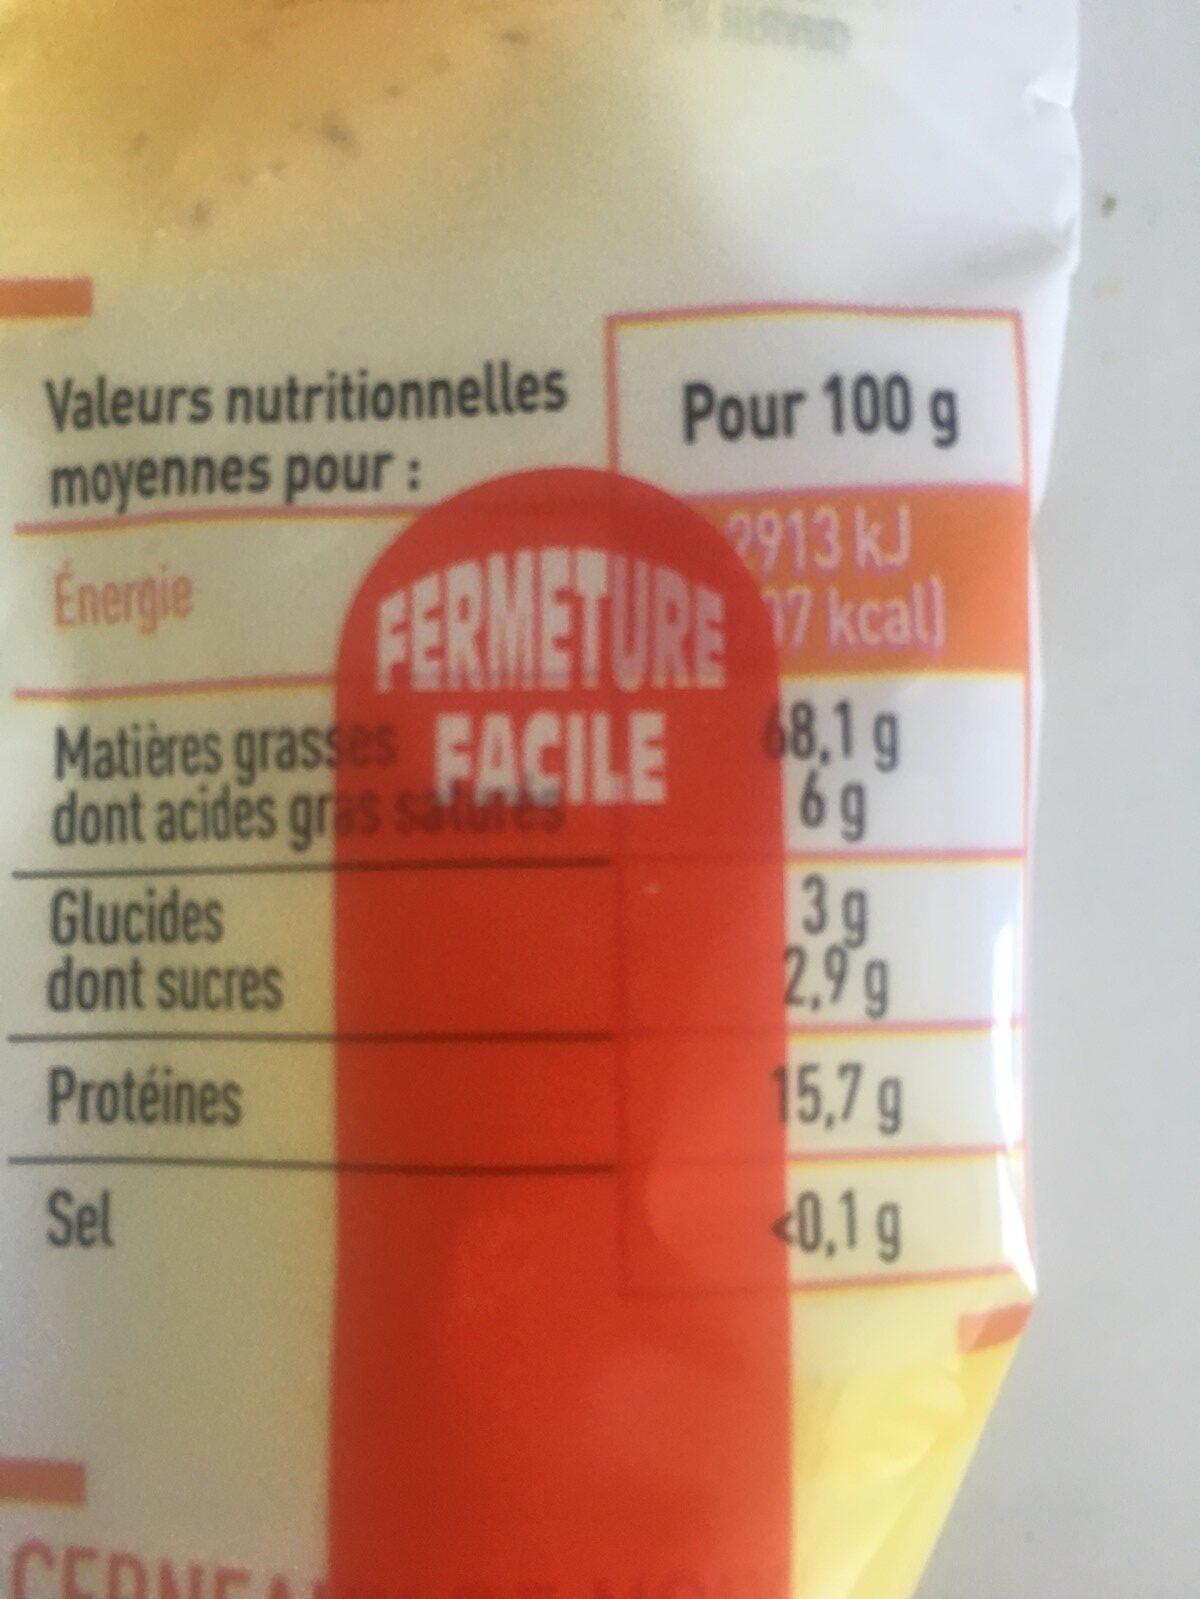 Cerneaux de noix - Ingrediënten - fr